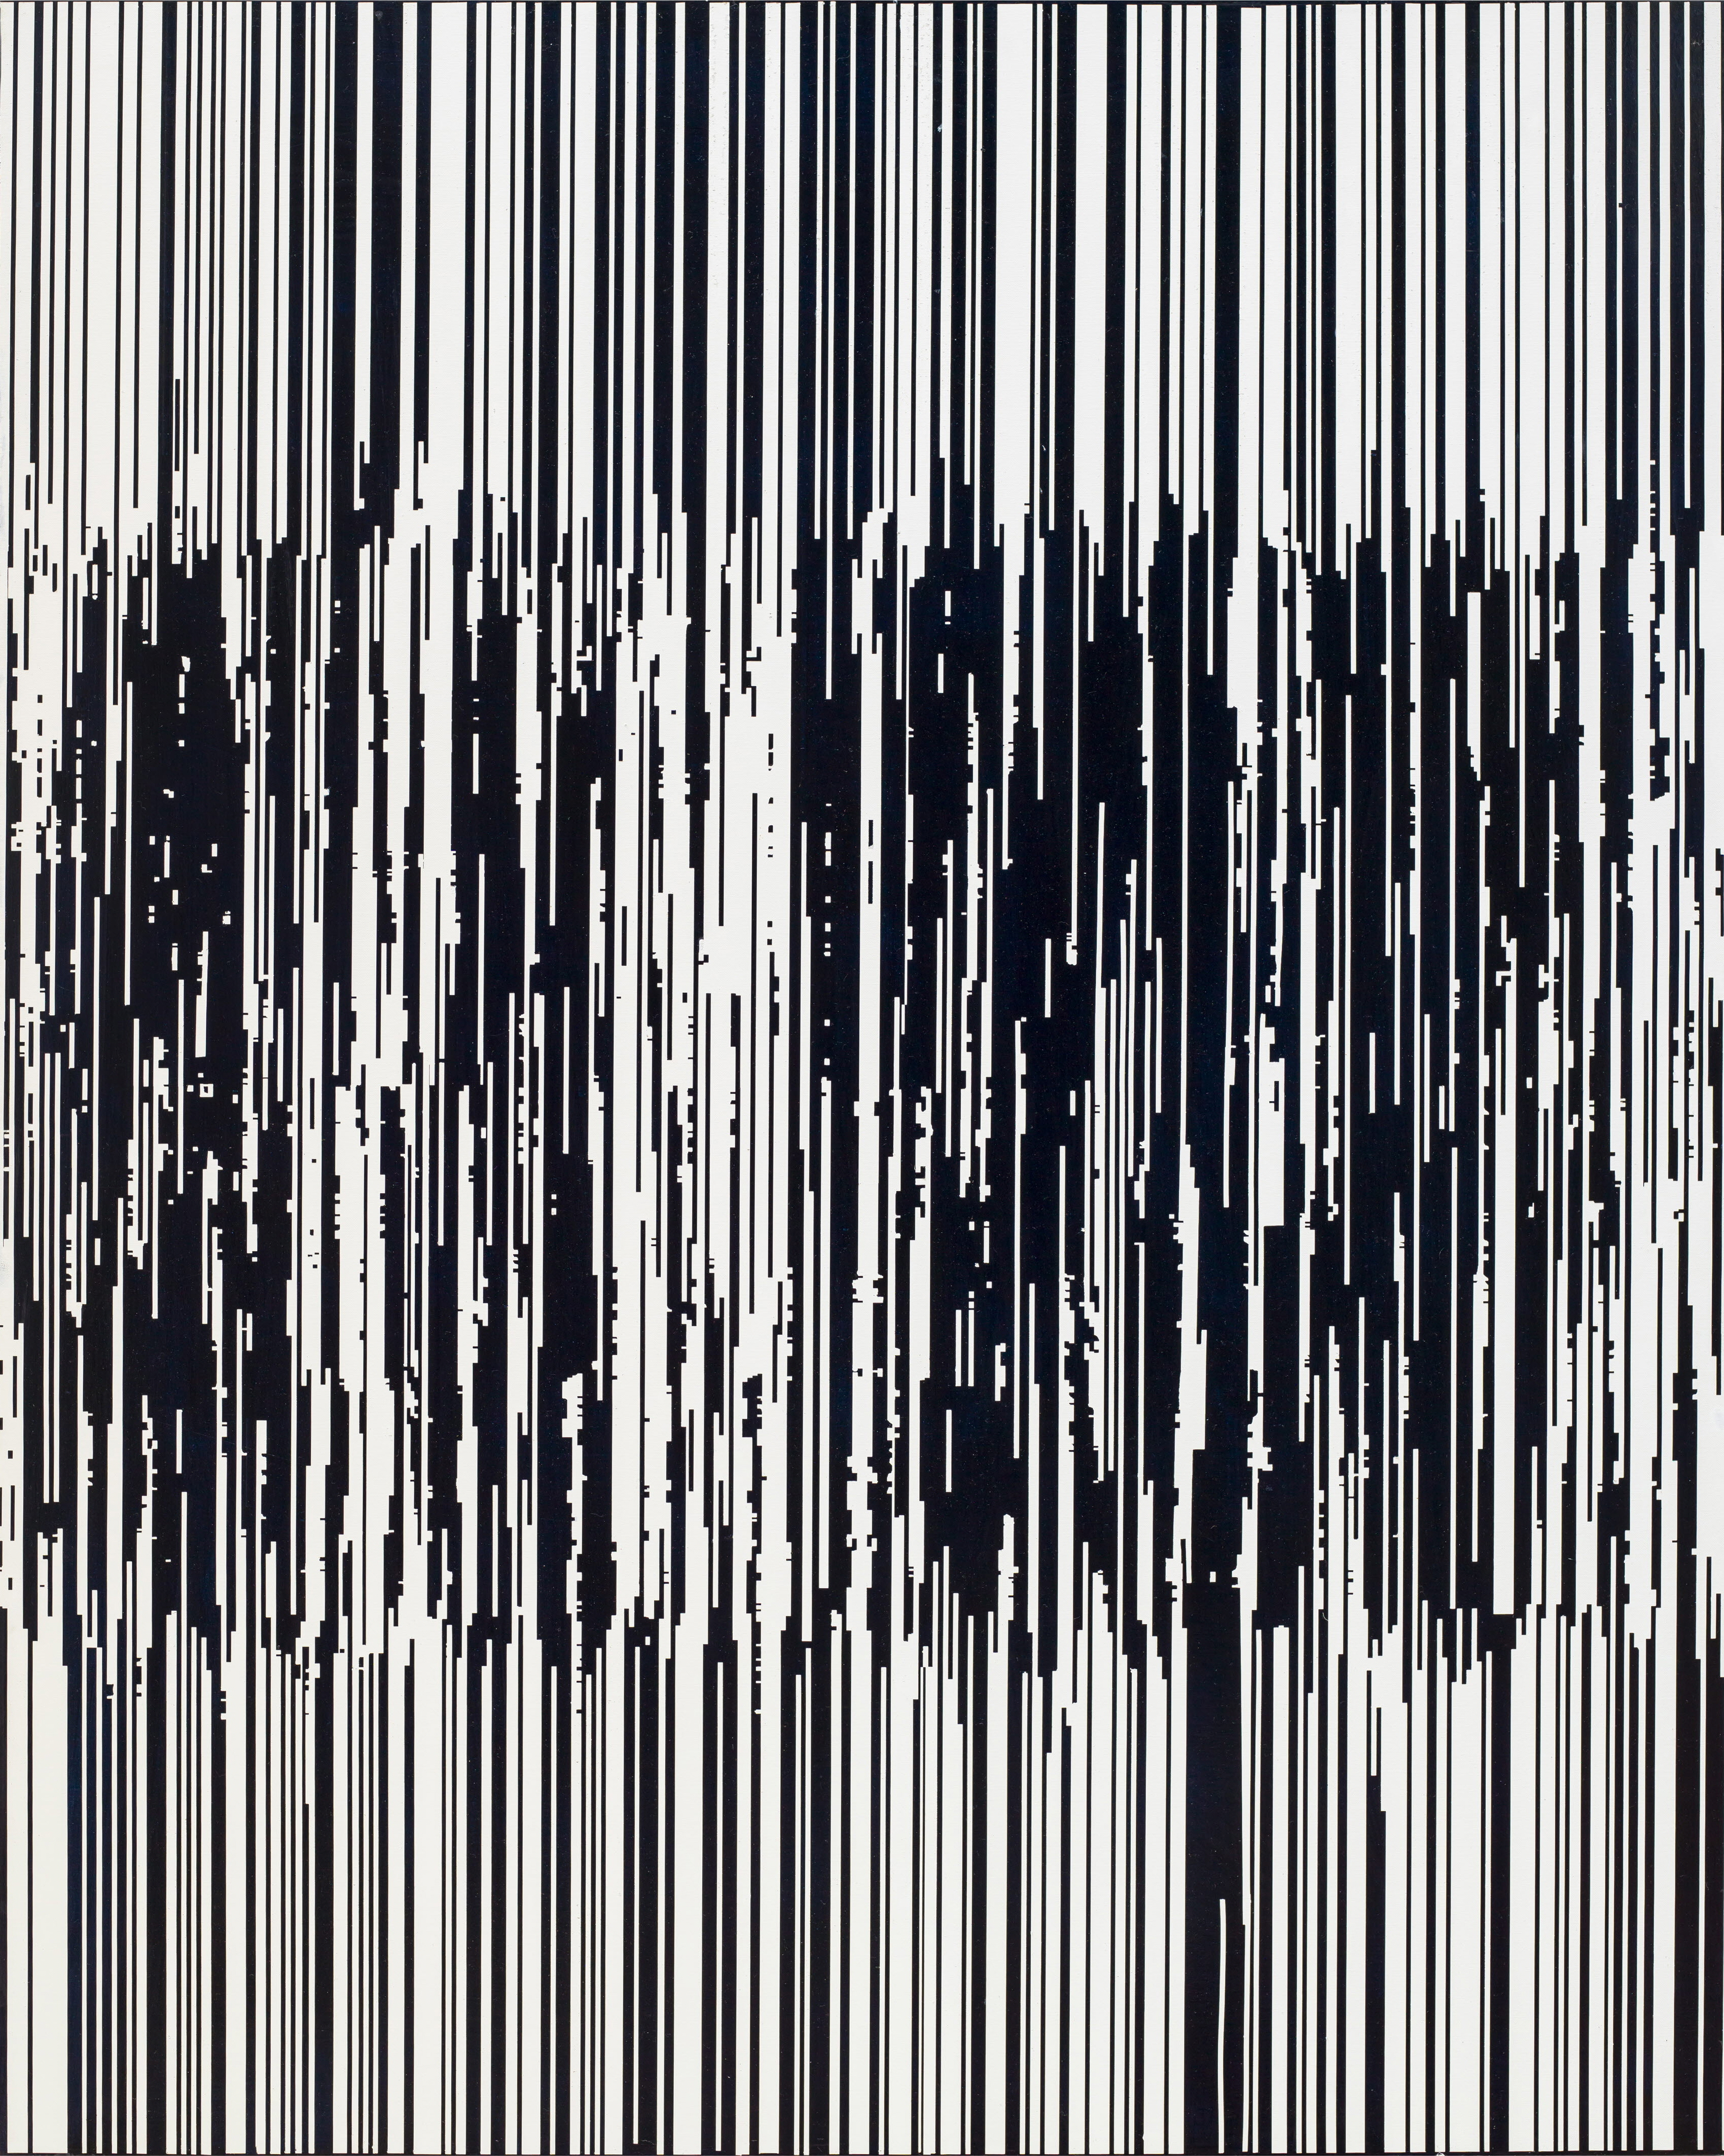 ENCODING 2015, Acrylic on canvas, 162.2 x 130.3